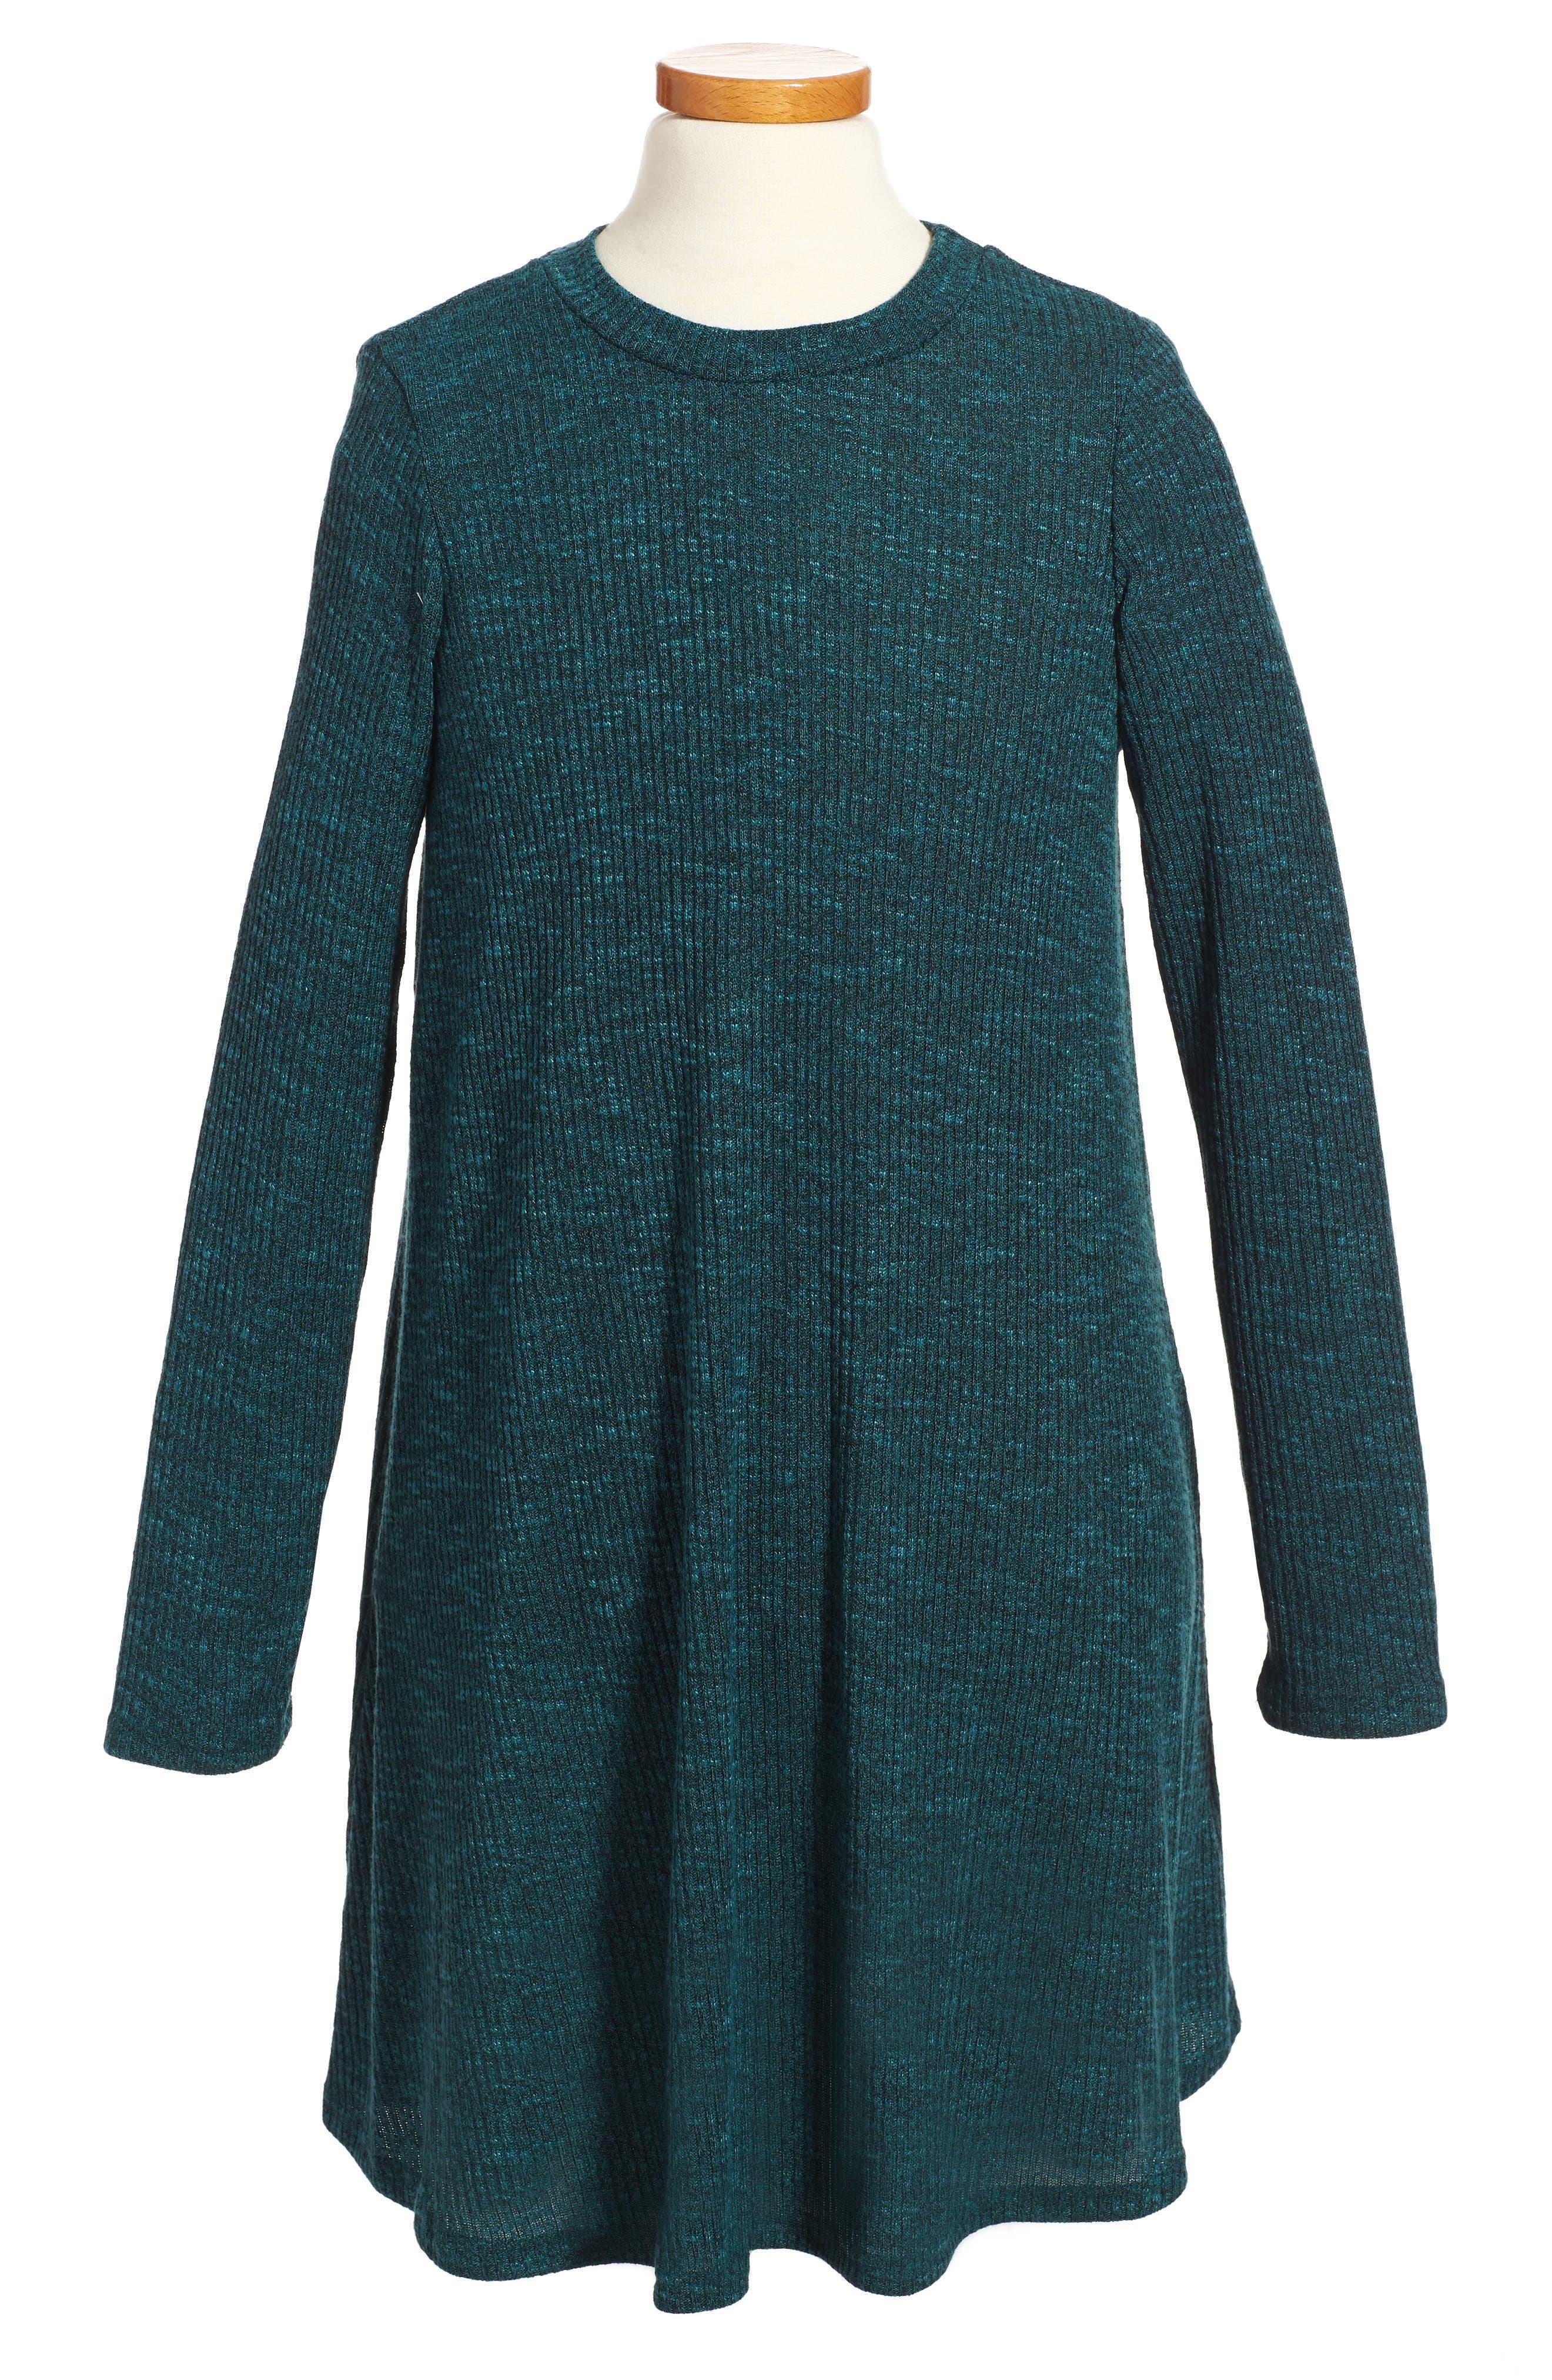 Rib Knit Sweater Dress,                             Main thumbnail 1, color,                             359